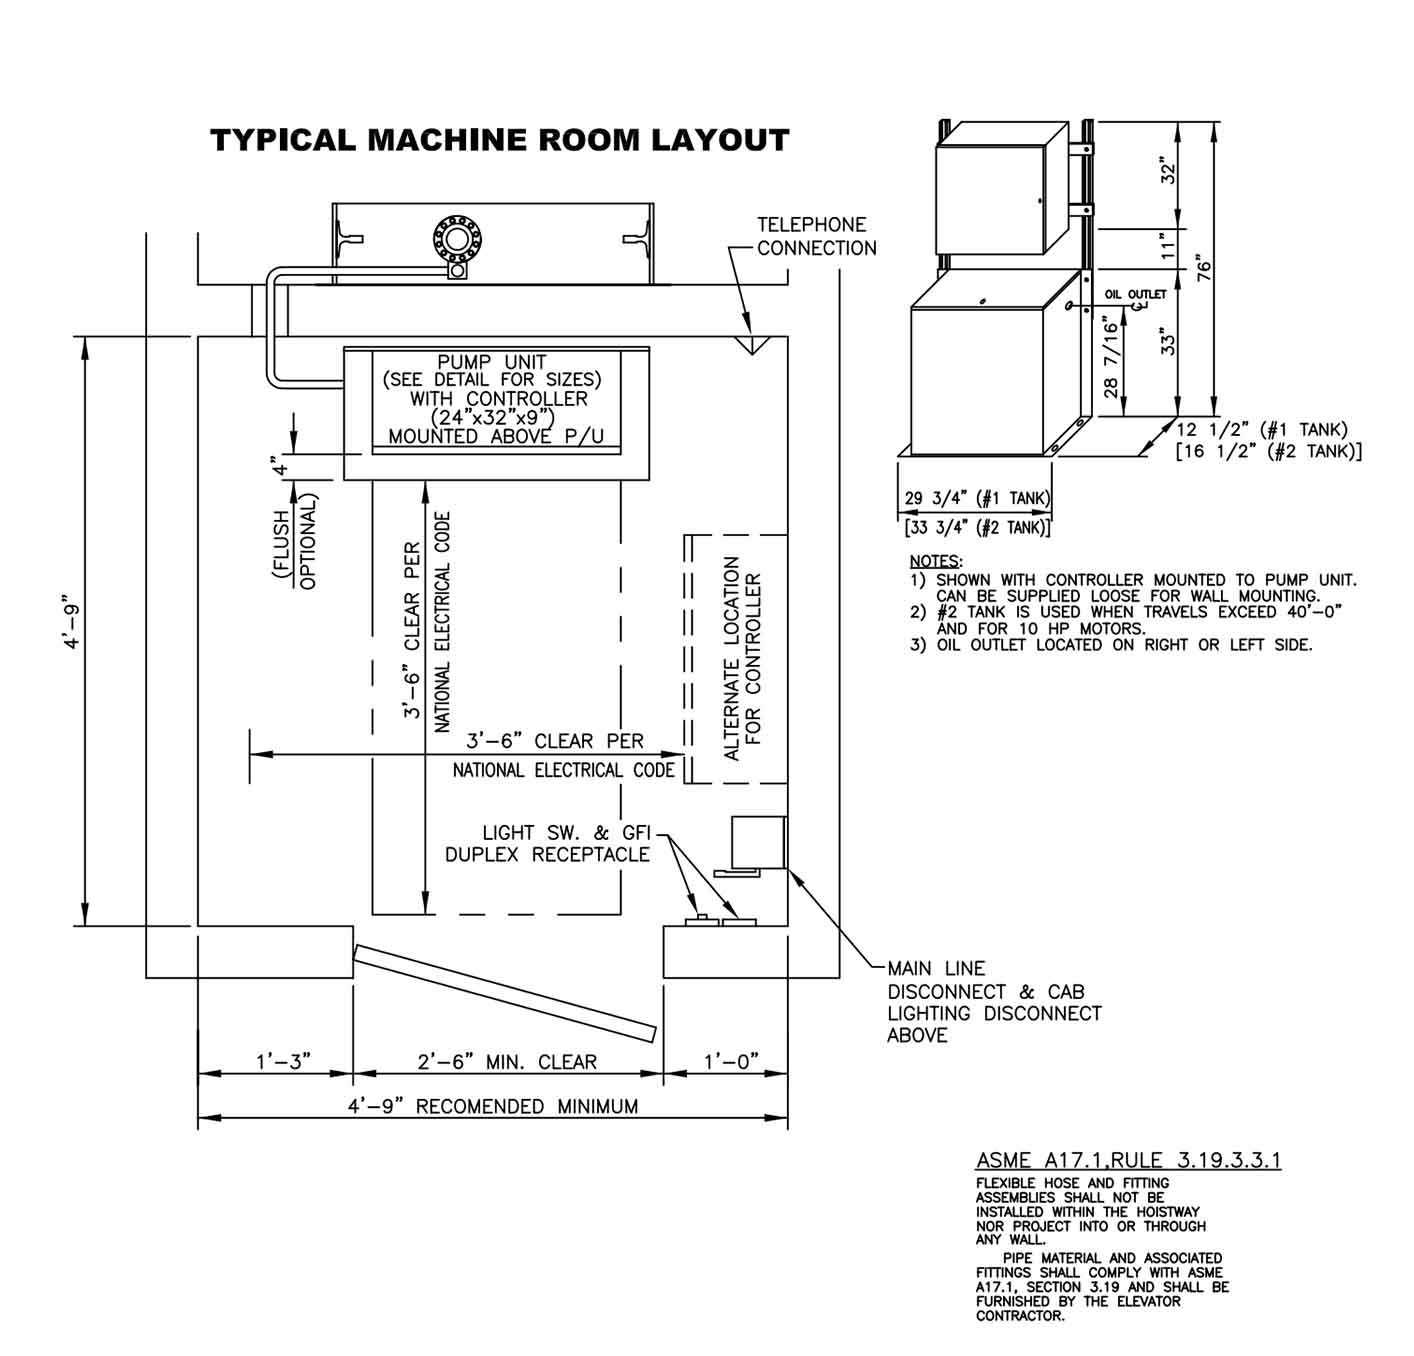 Lula Drawings Custom Elevator Circuit Diagram Machine Room